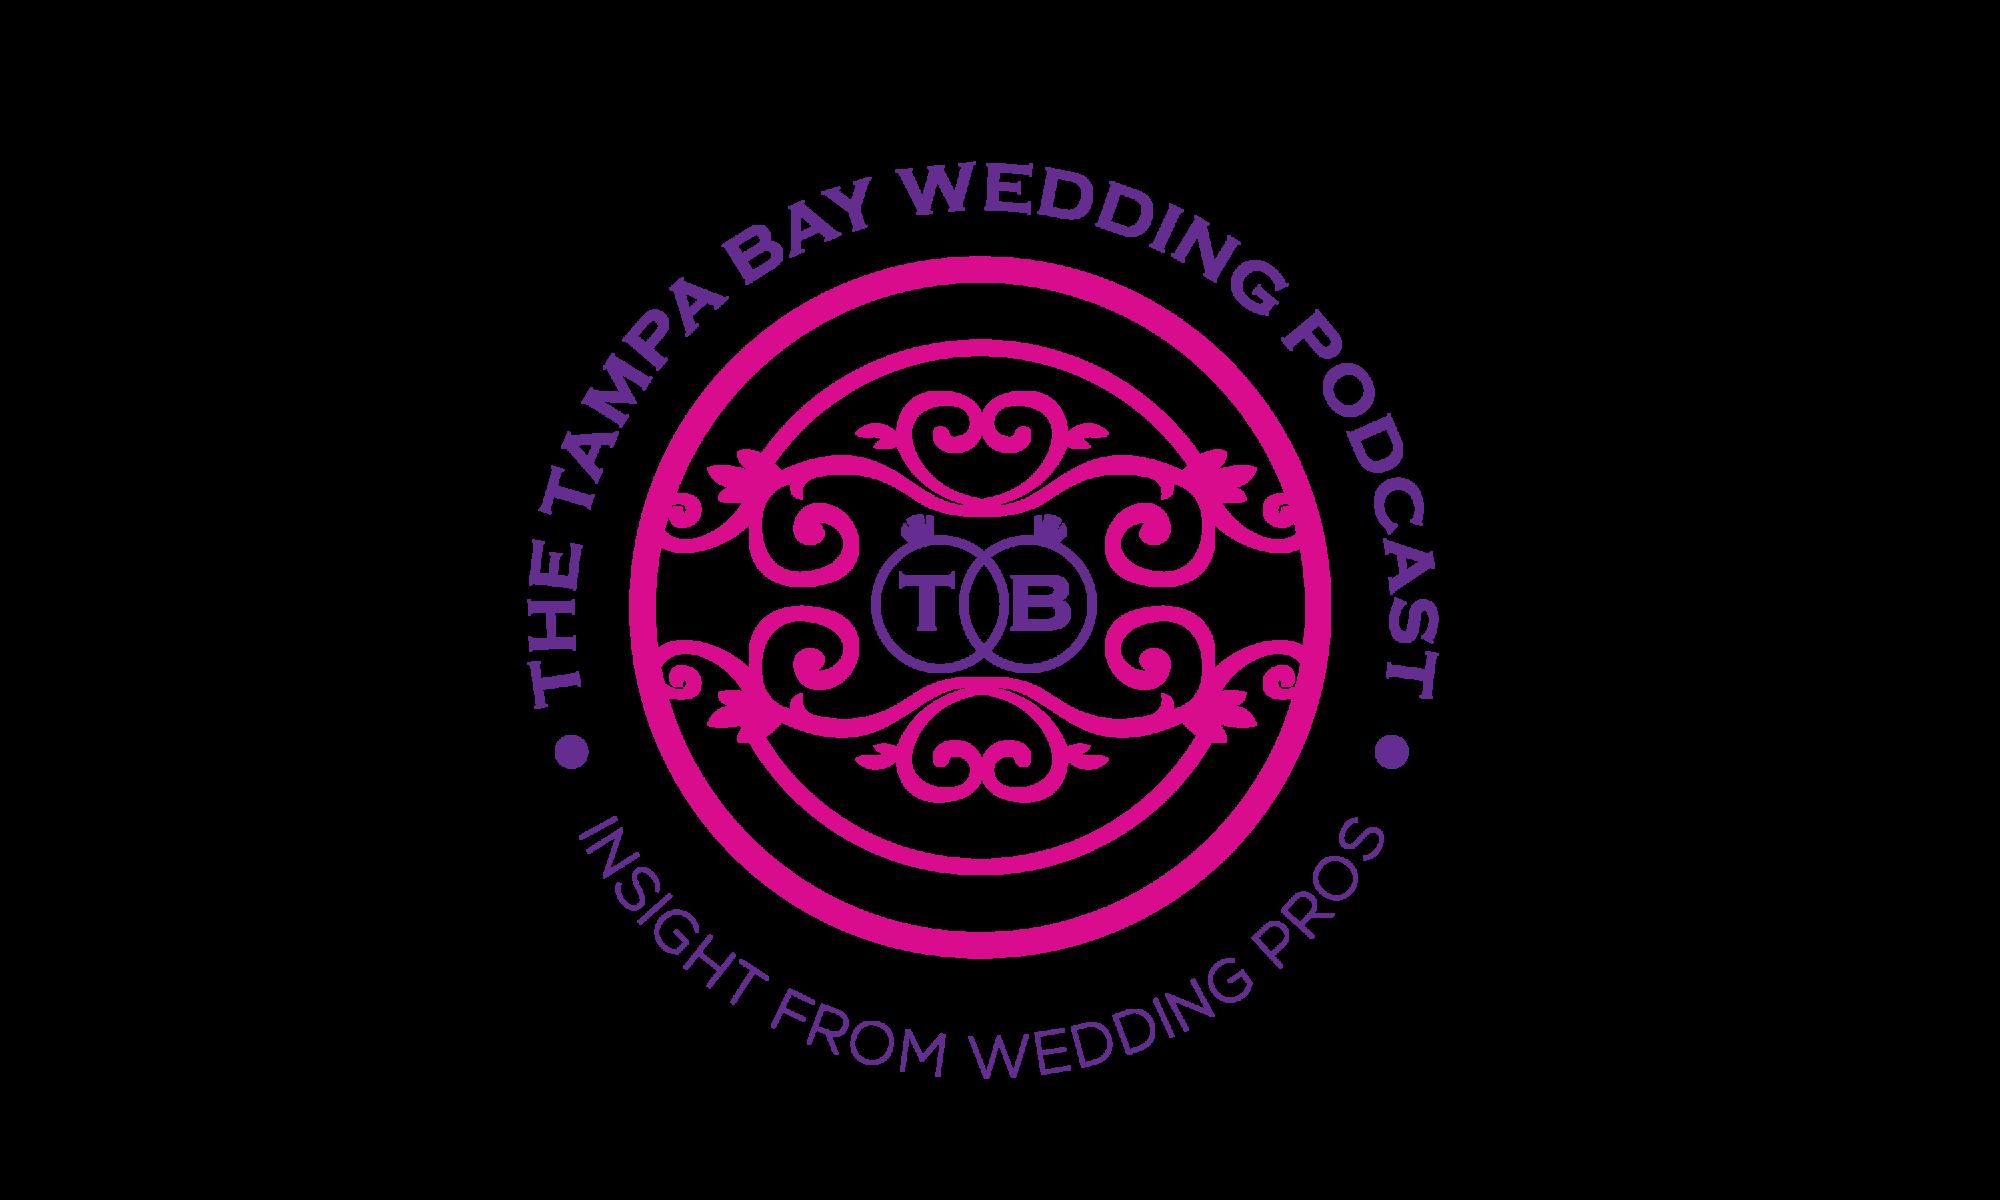 Tampa Bay Wedding DJ Podcast